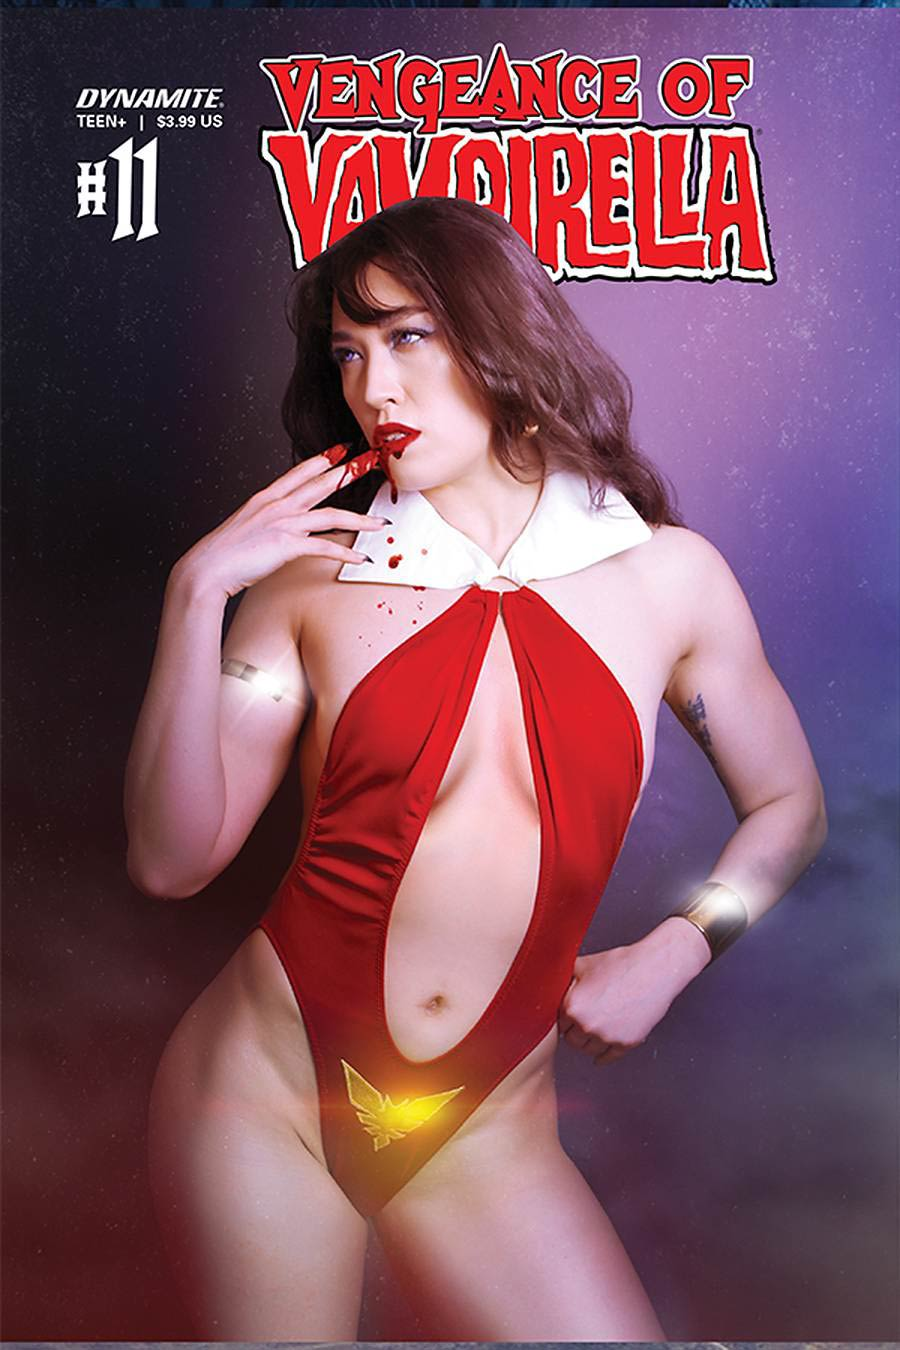 Vengeance Of Vampirella Vol 2 #11 Cover D Variant Krista Lee Cosplay Photo Cover